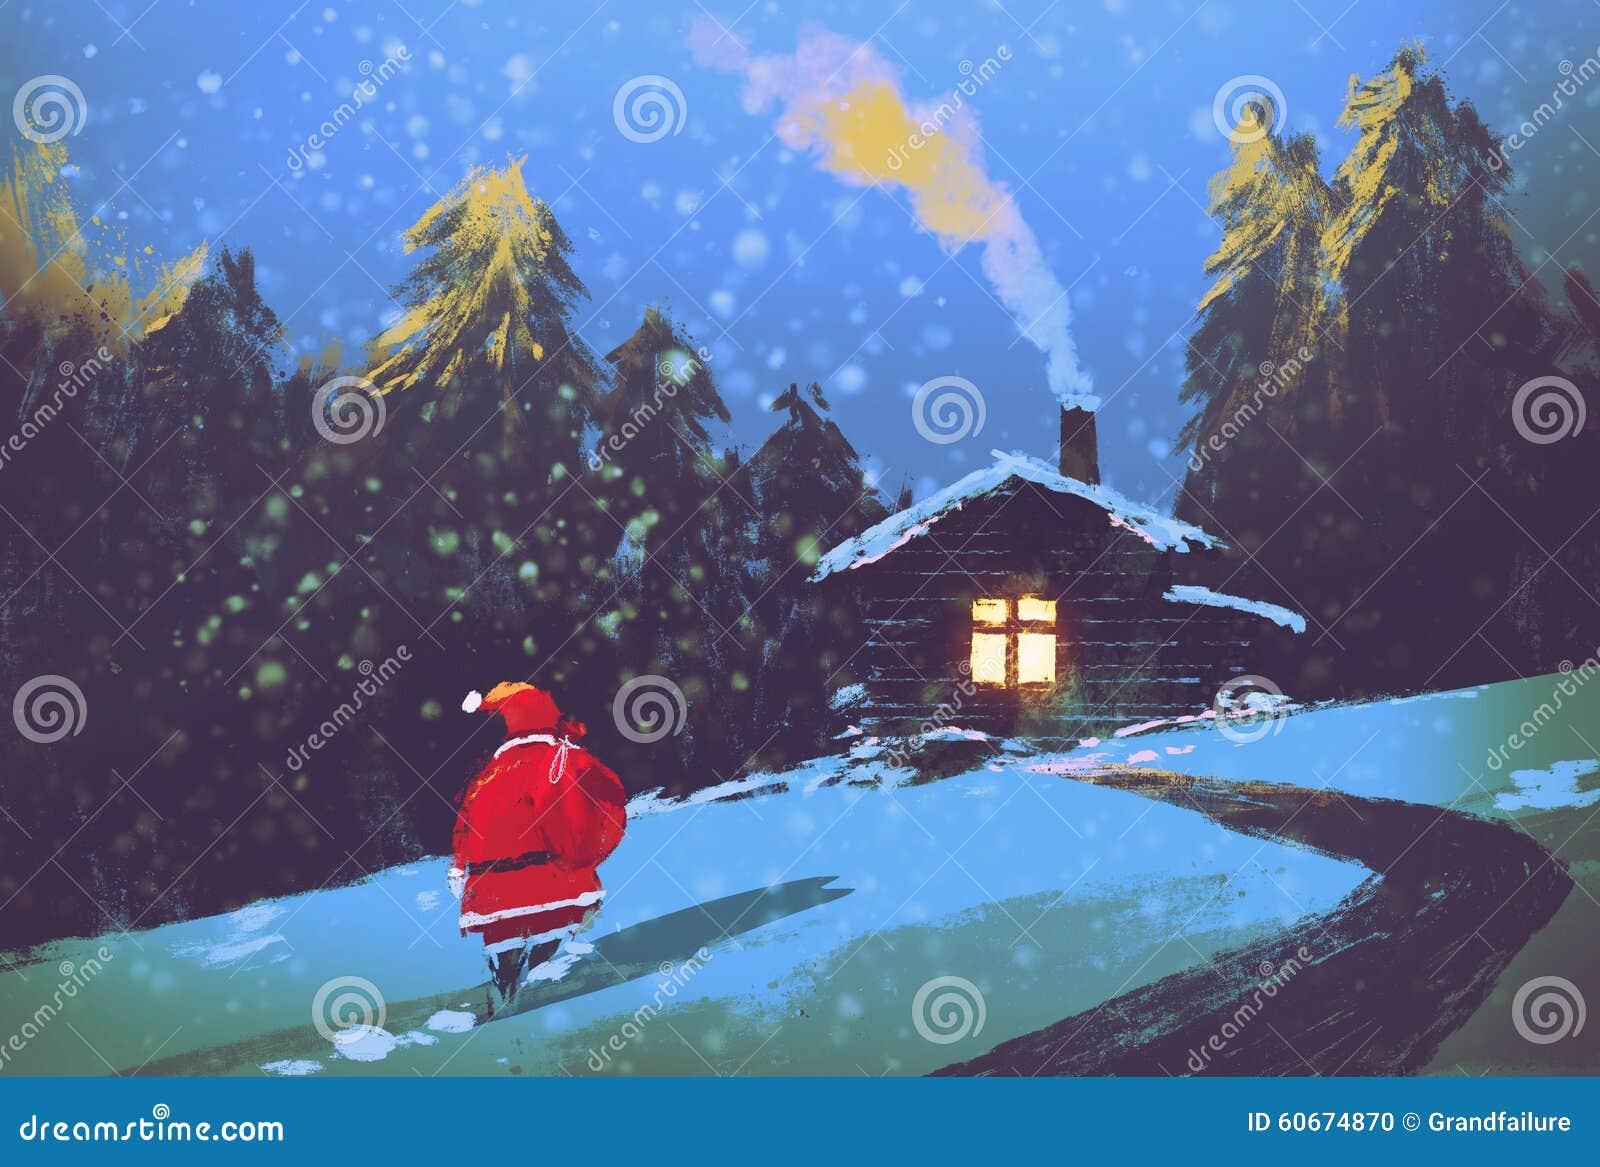 Santa claus and wooden house at christmas night illustration painting